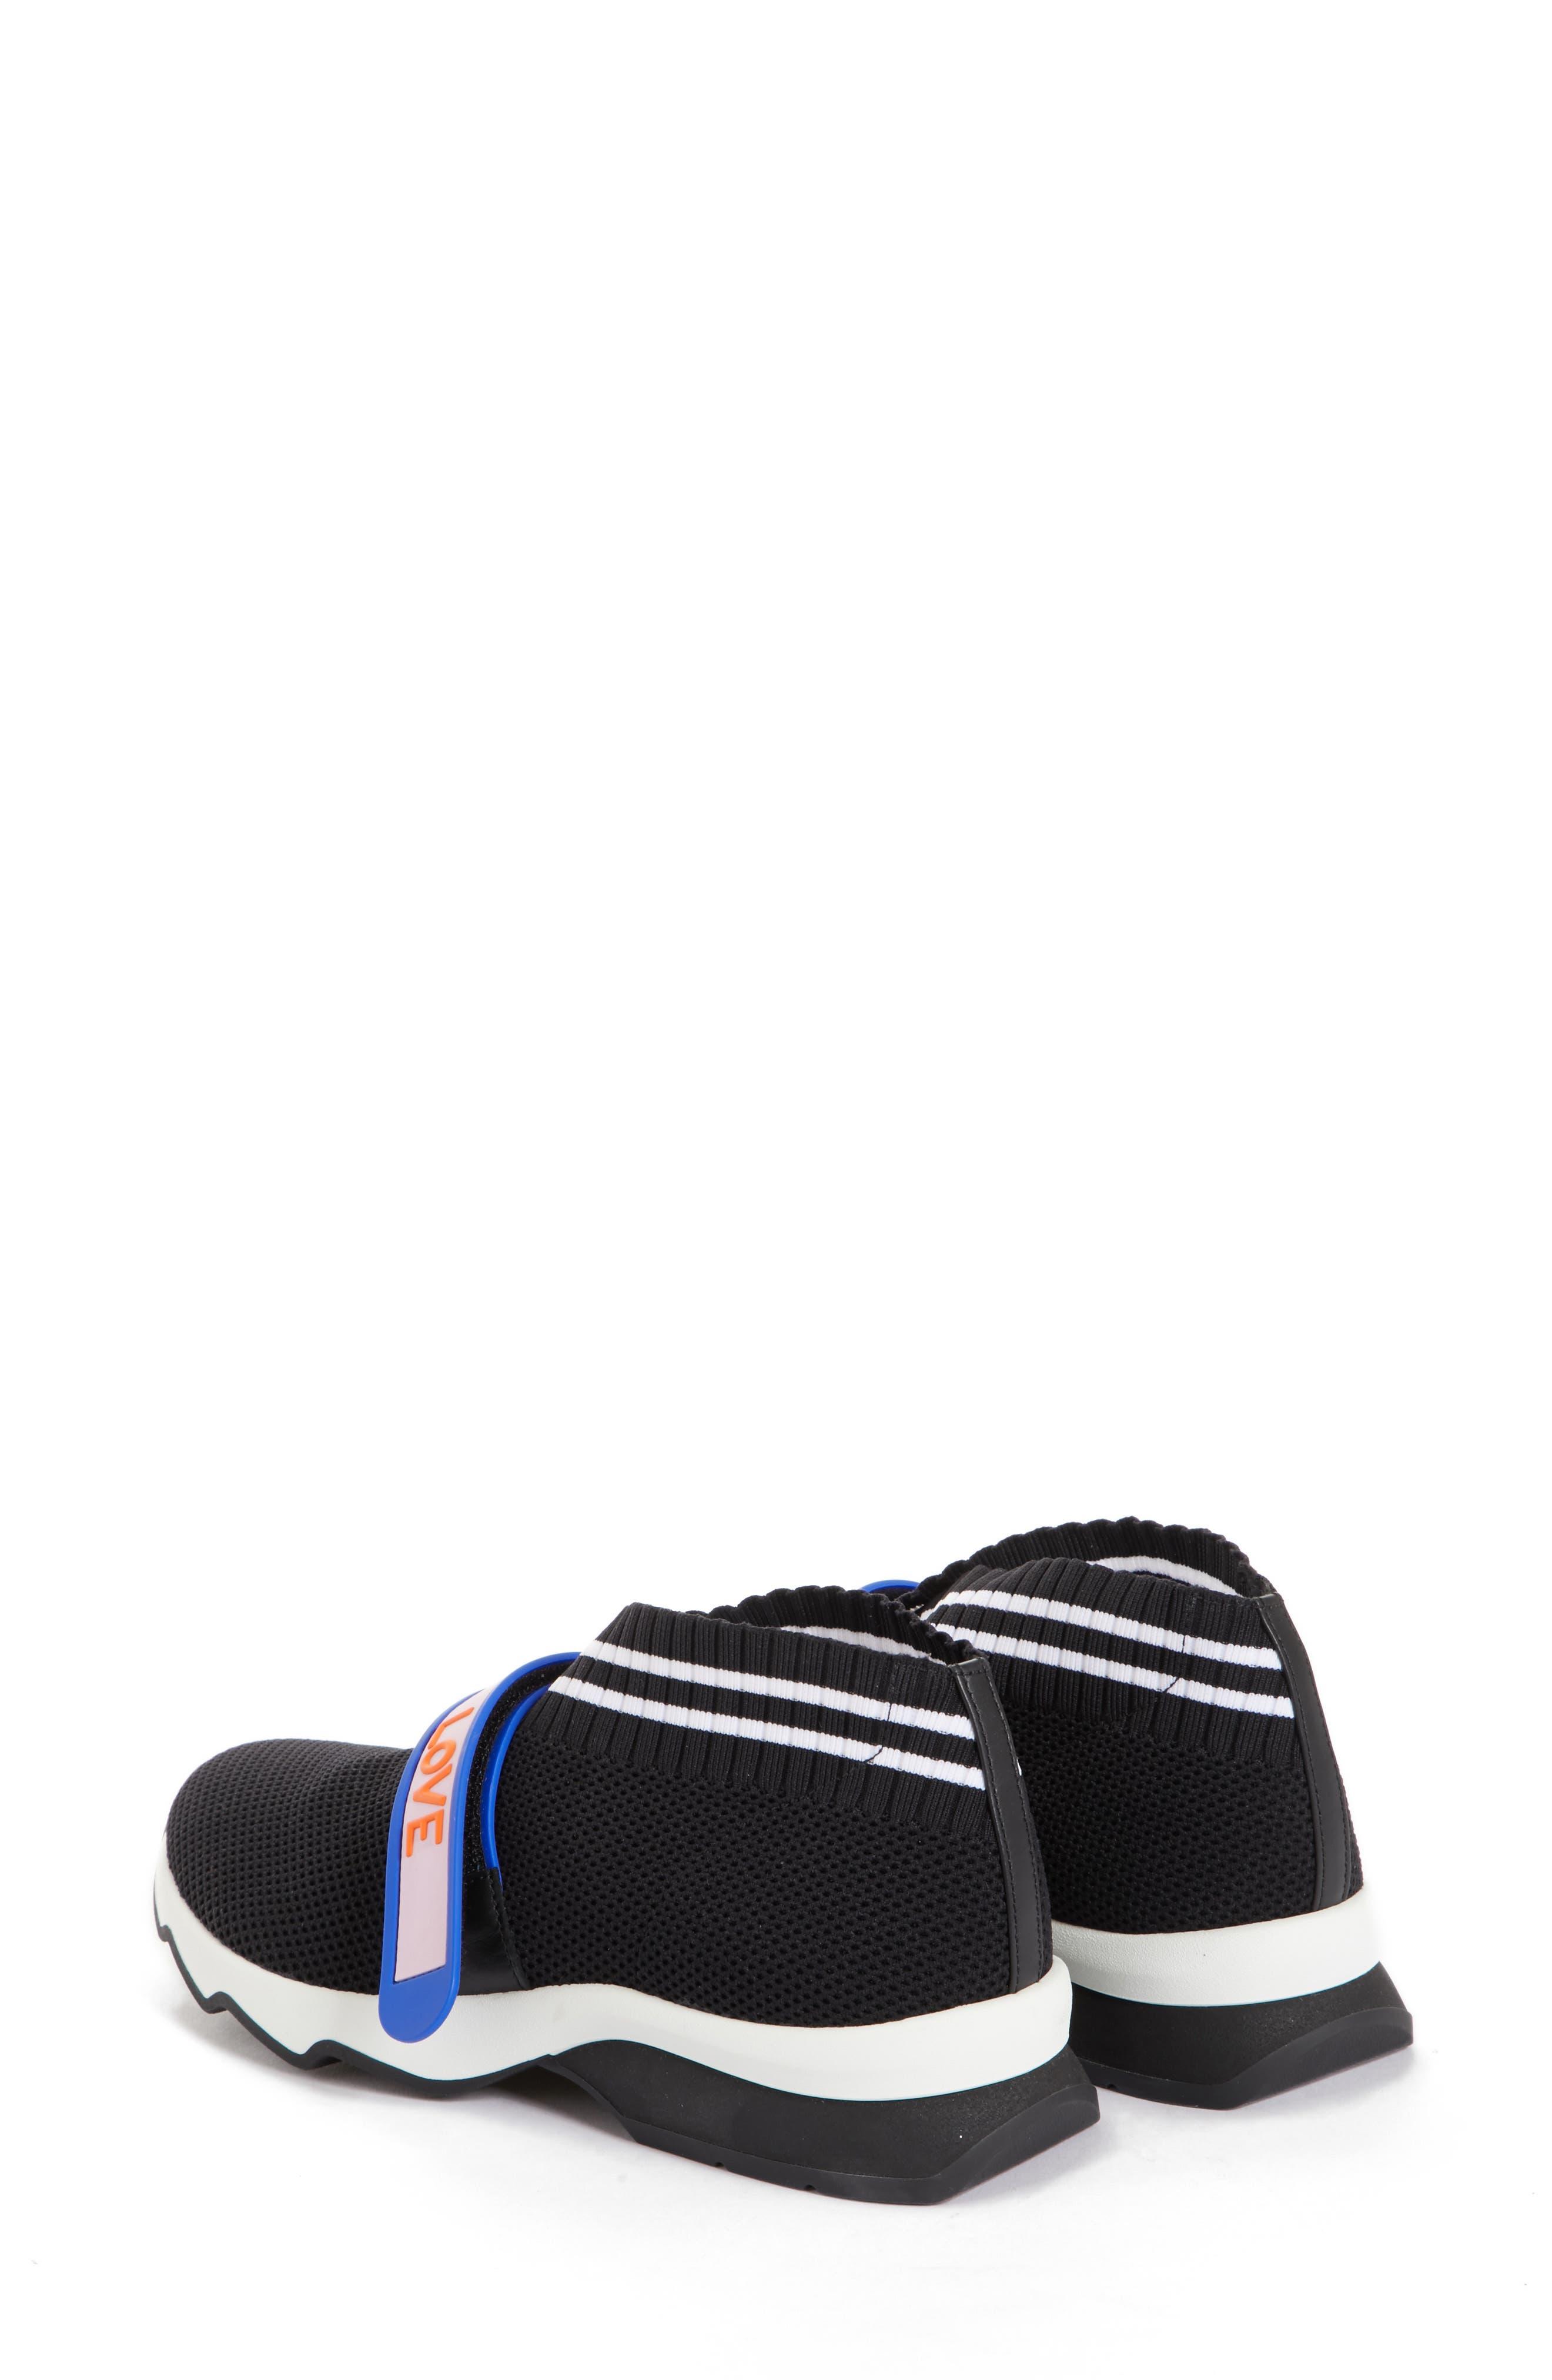 Rockoko Mismatch Sneaker,                             Alternate thumbnail 2, color,                             Black